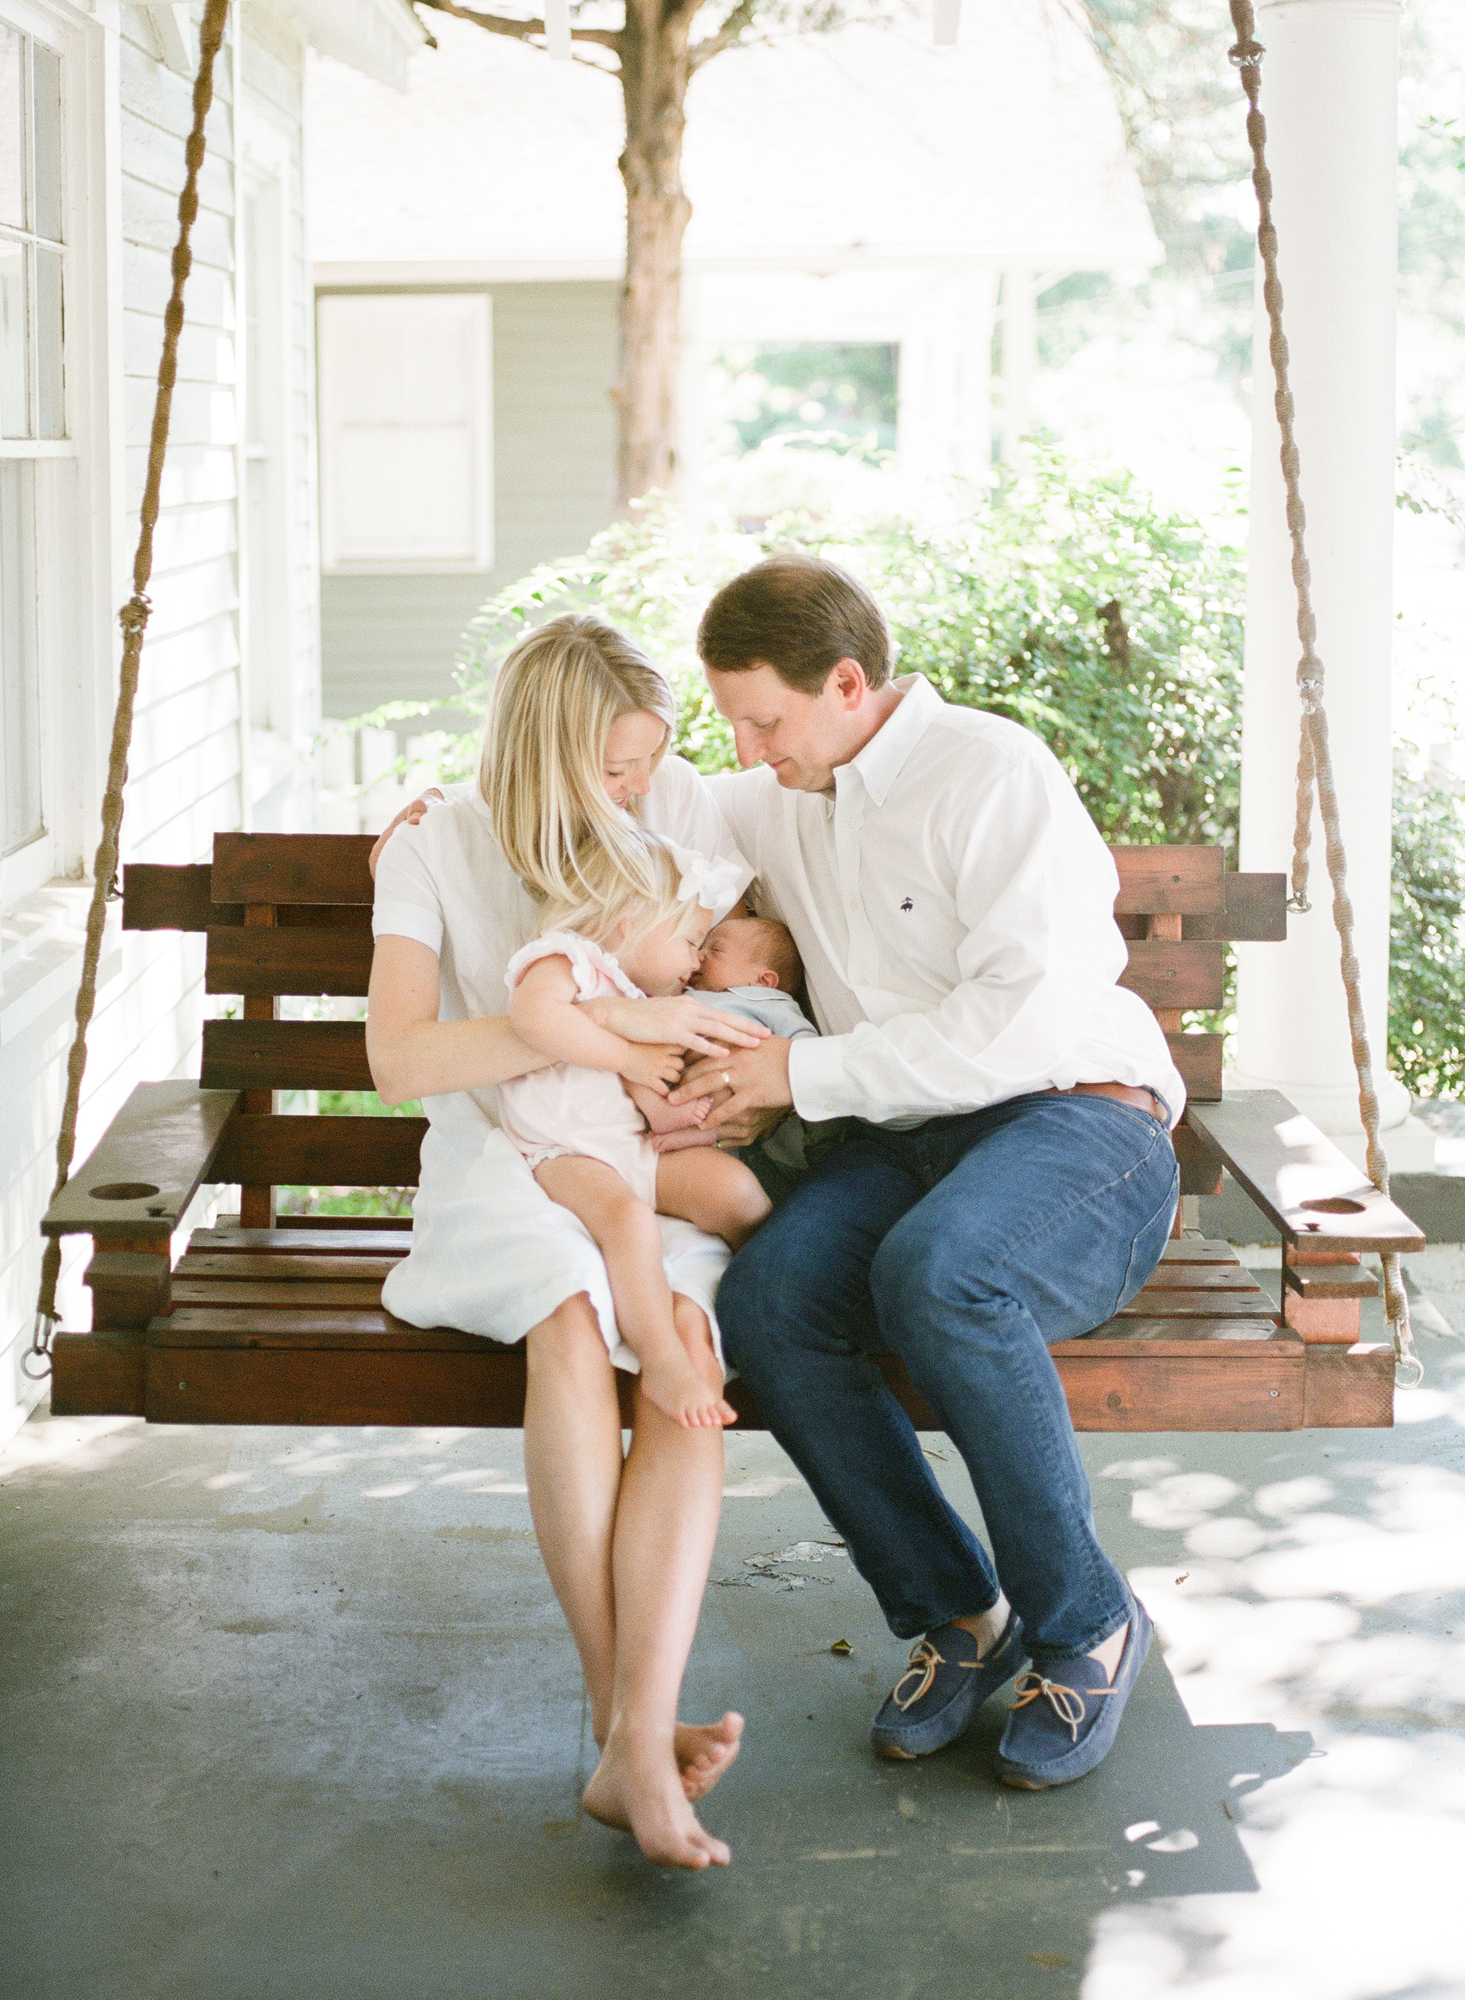 raleigh-newborn-photographer-lifestyle-baby-session-018